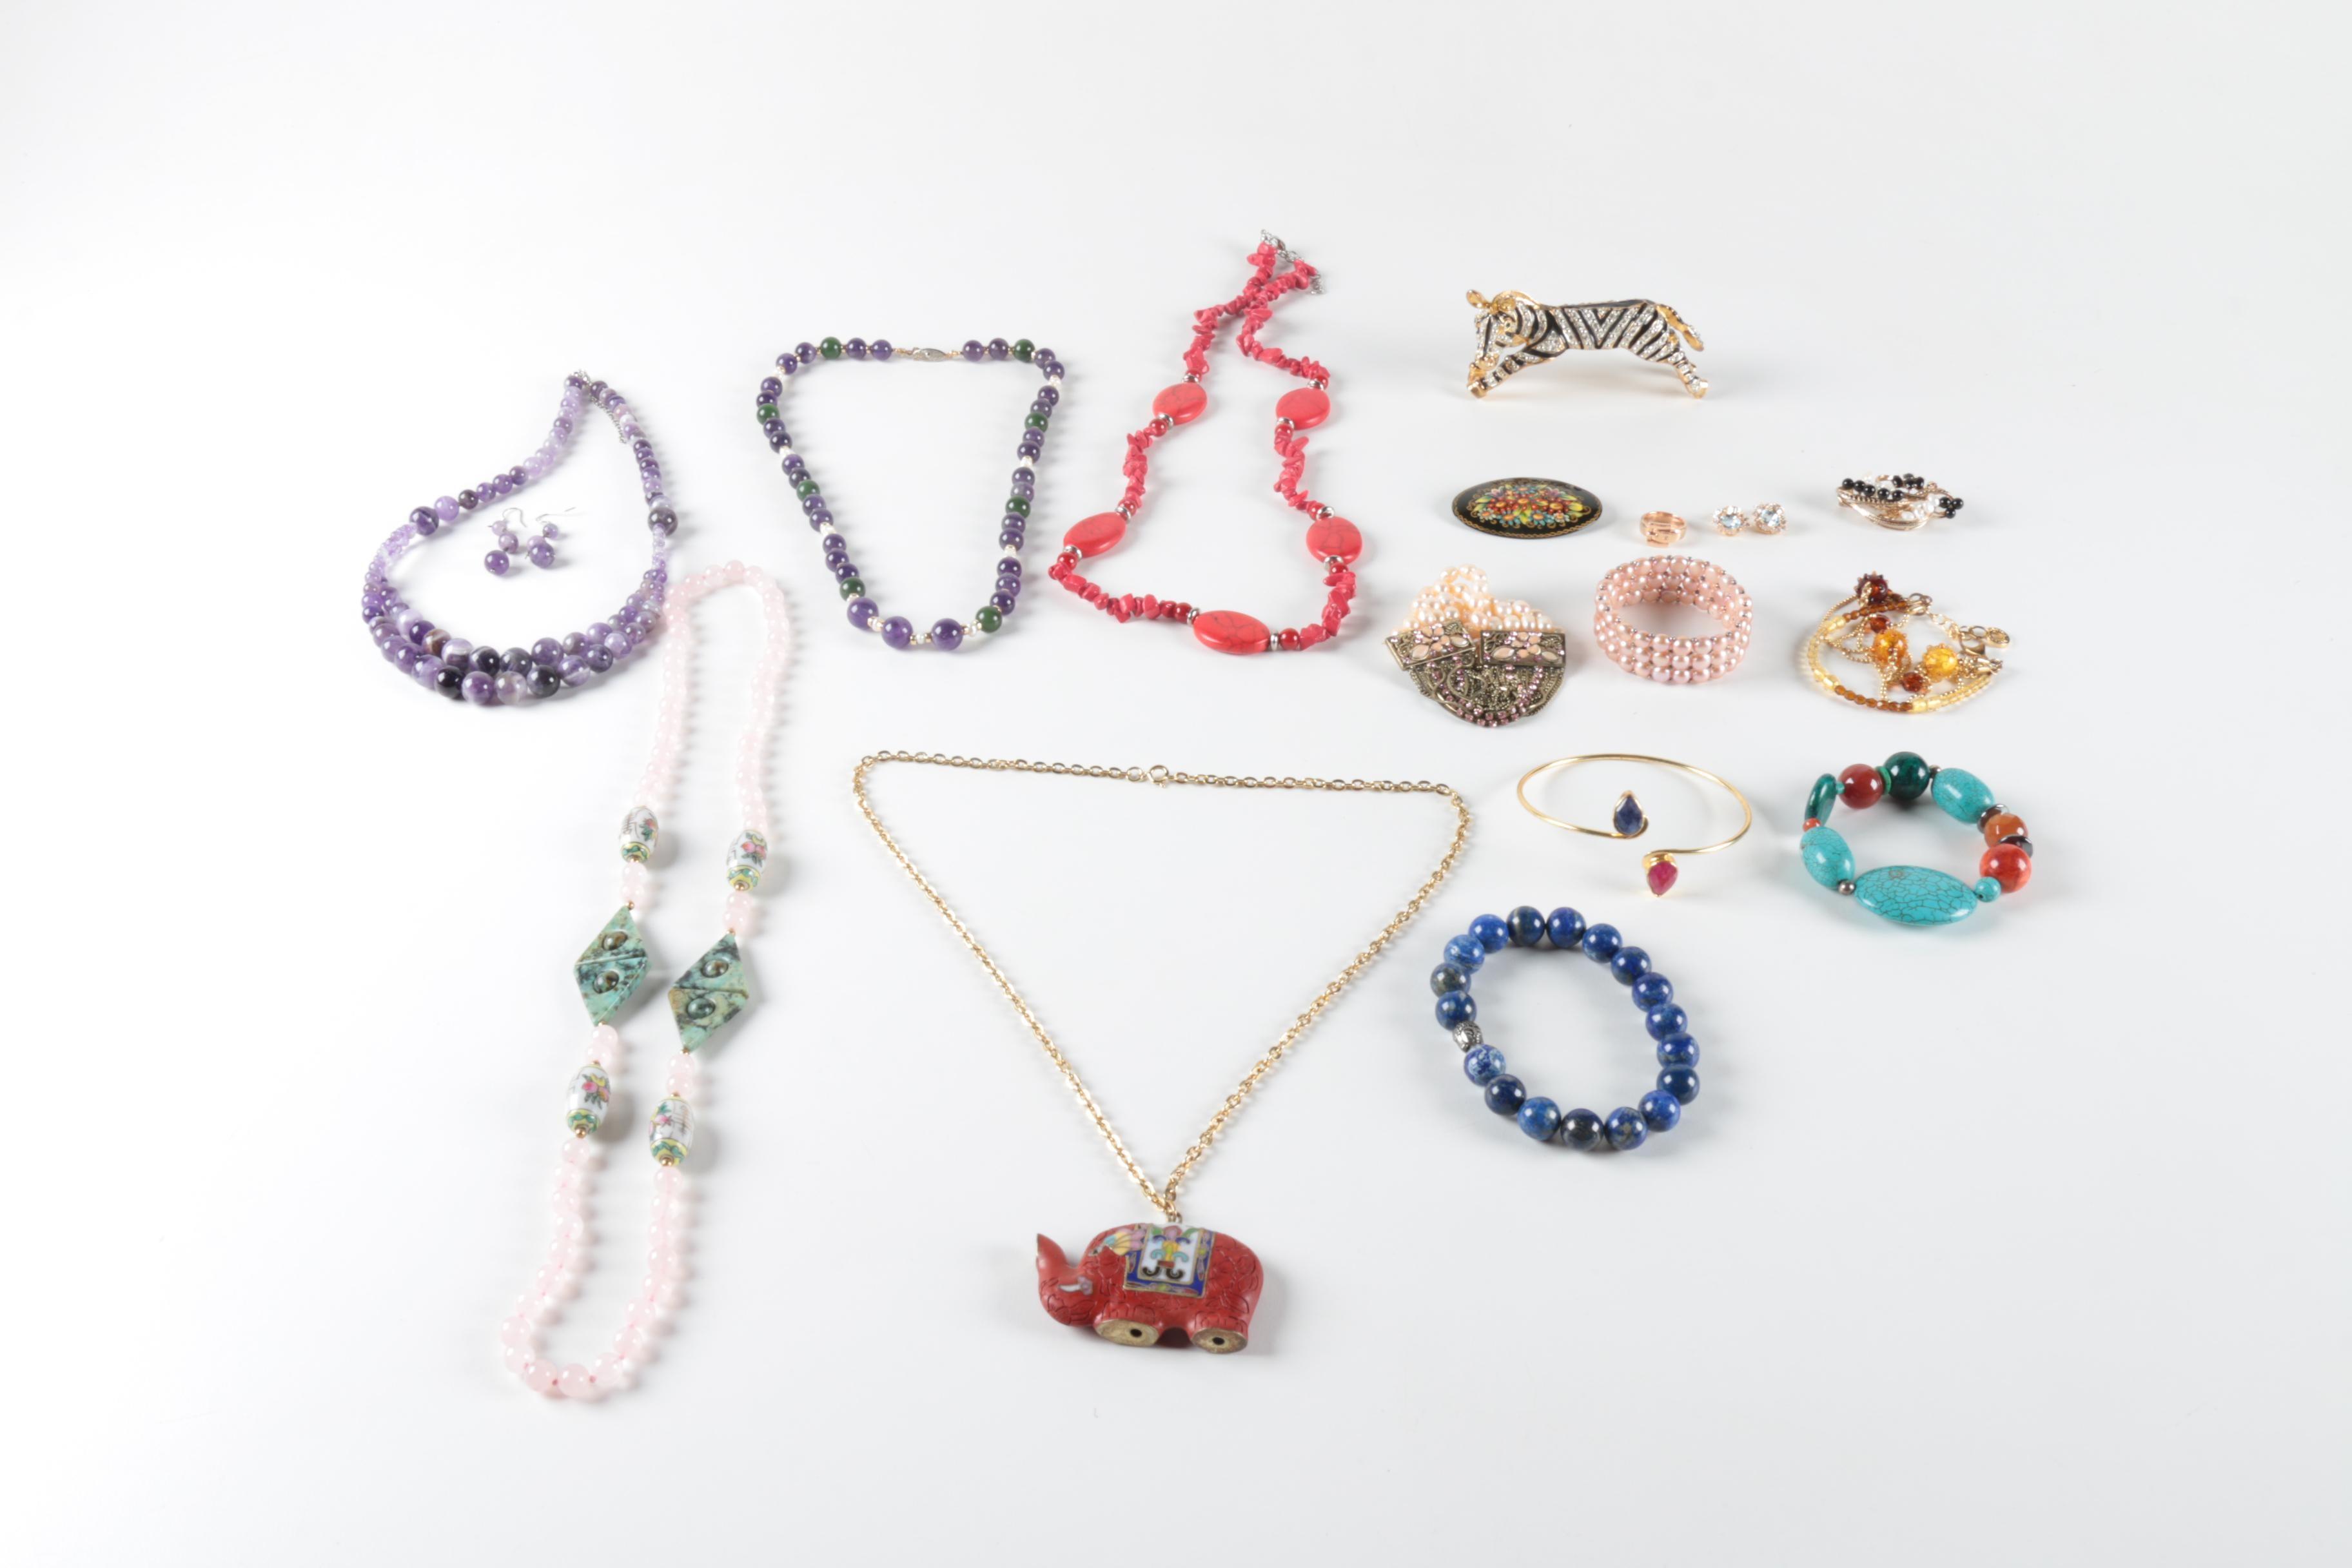 Costume Gemstone Jewelry Selection Including Michael Kors